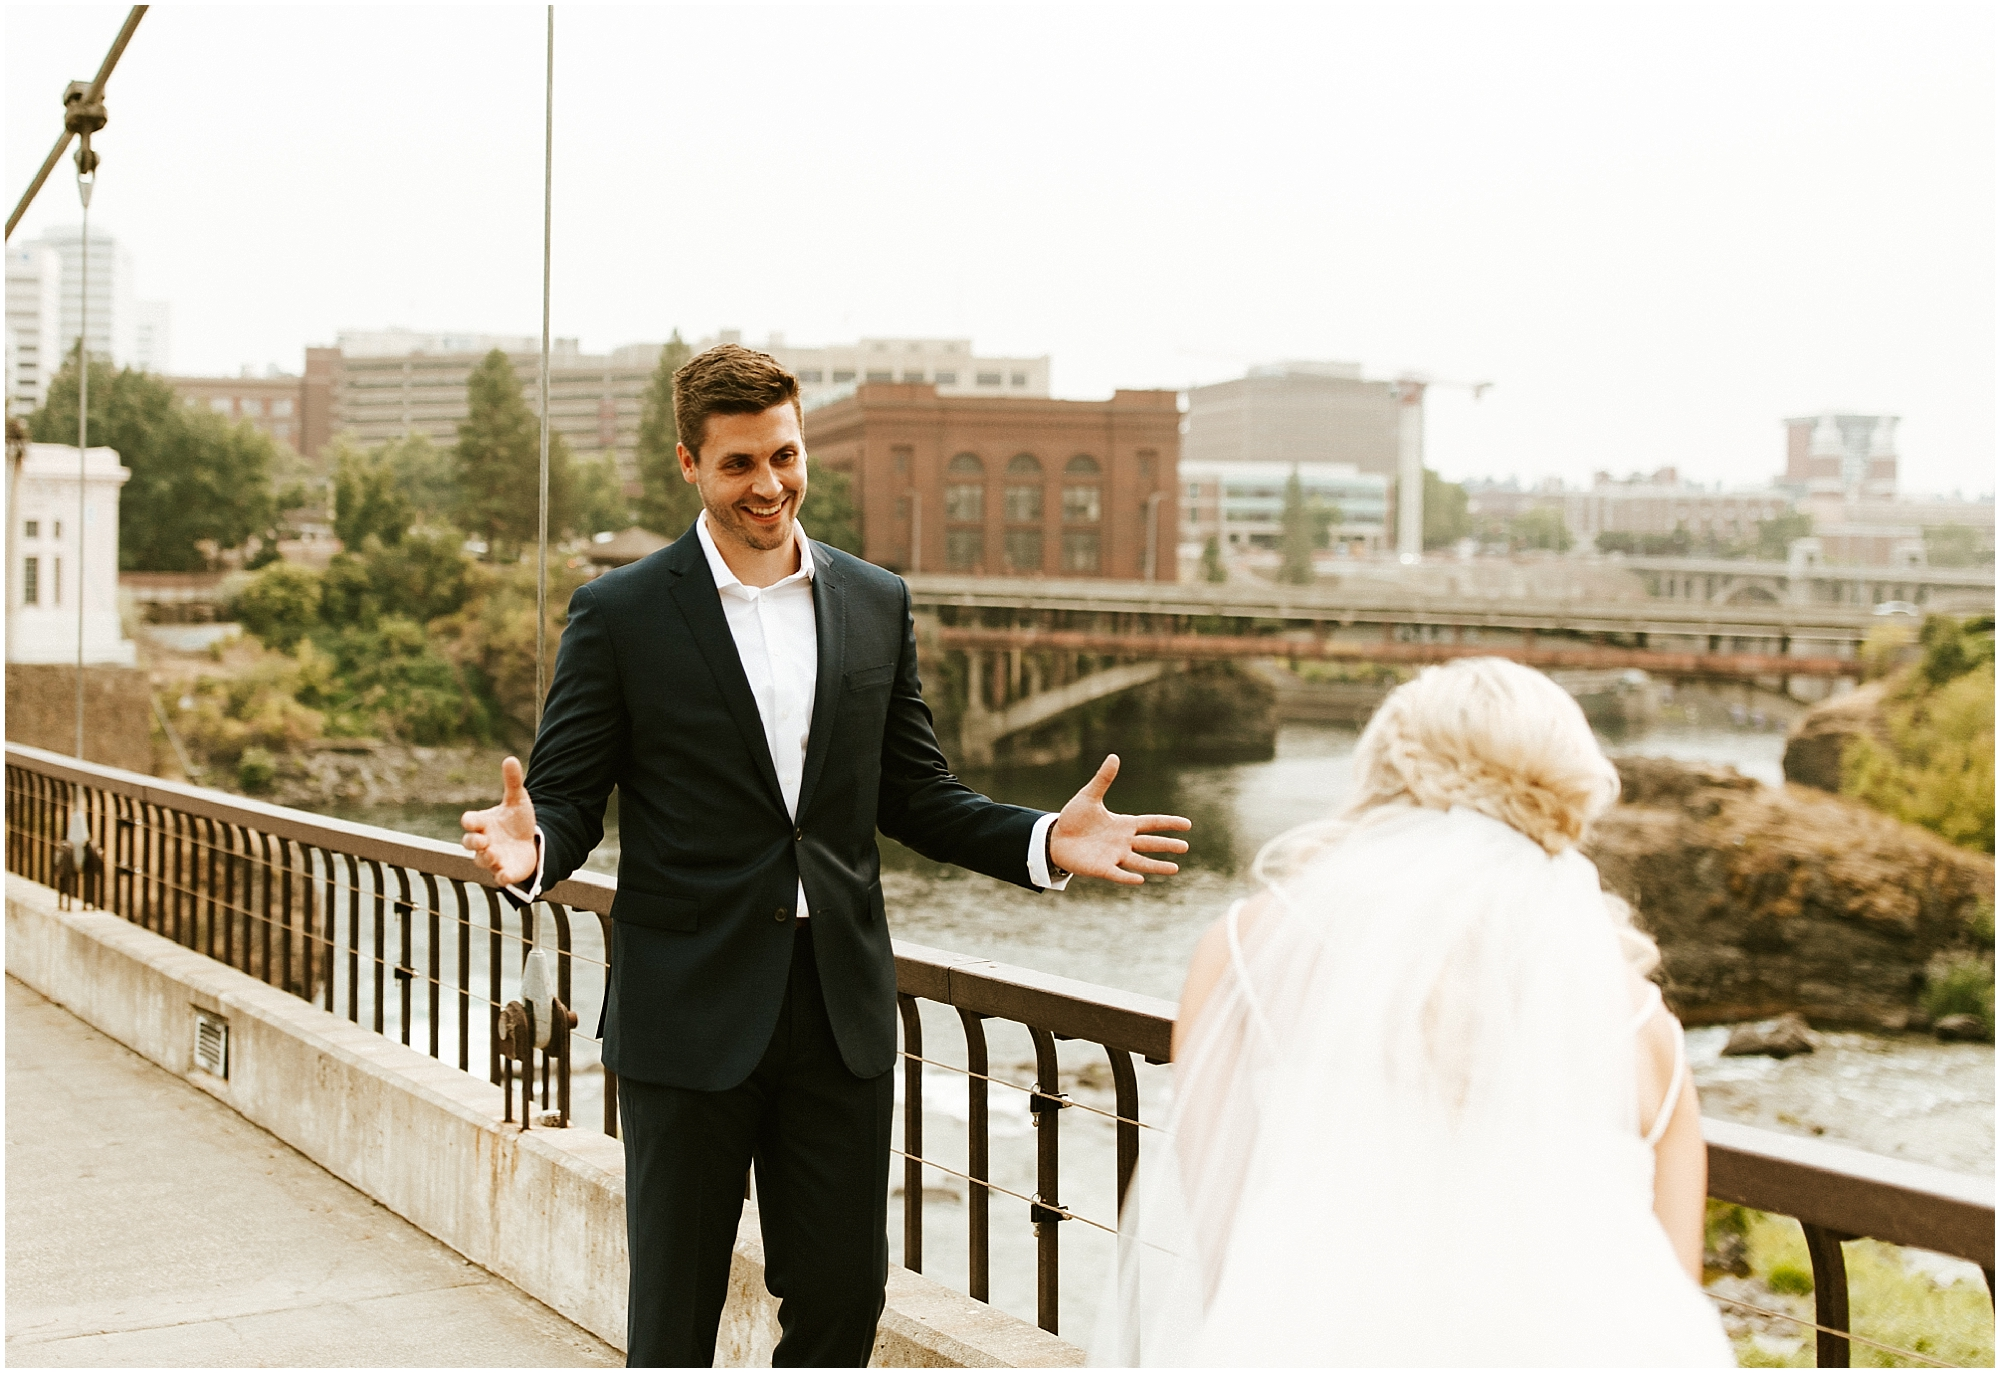 Chateau Rive Spokane Wedding Cassie Trottier Photography1023.jpg